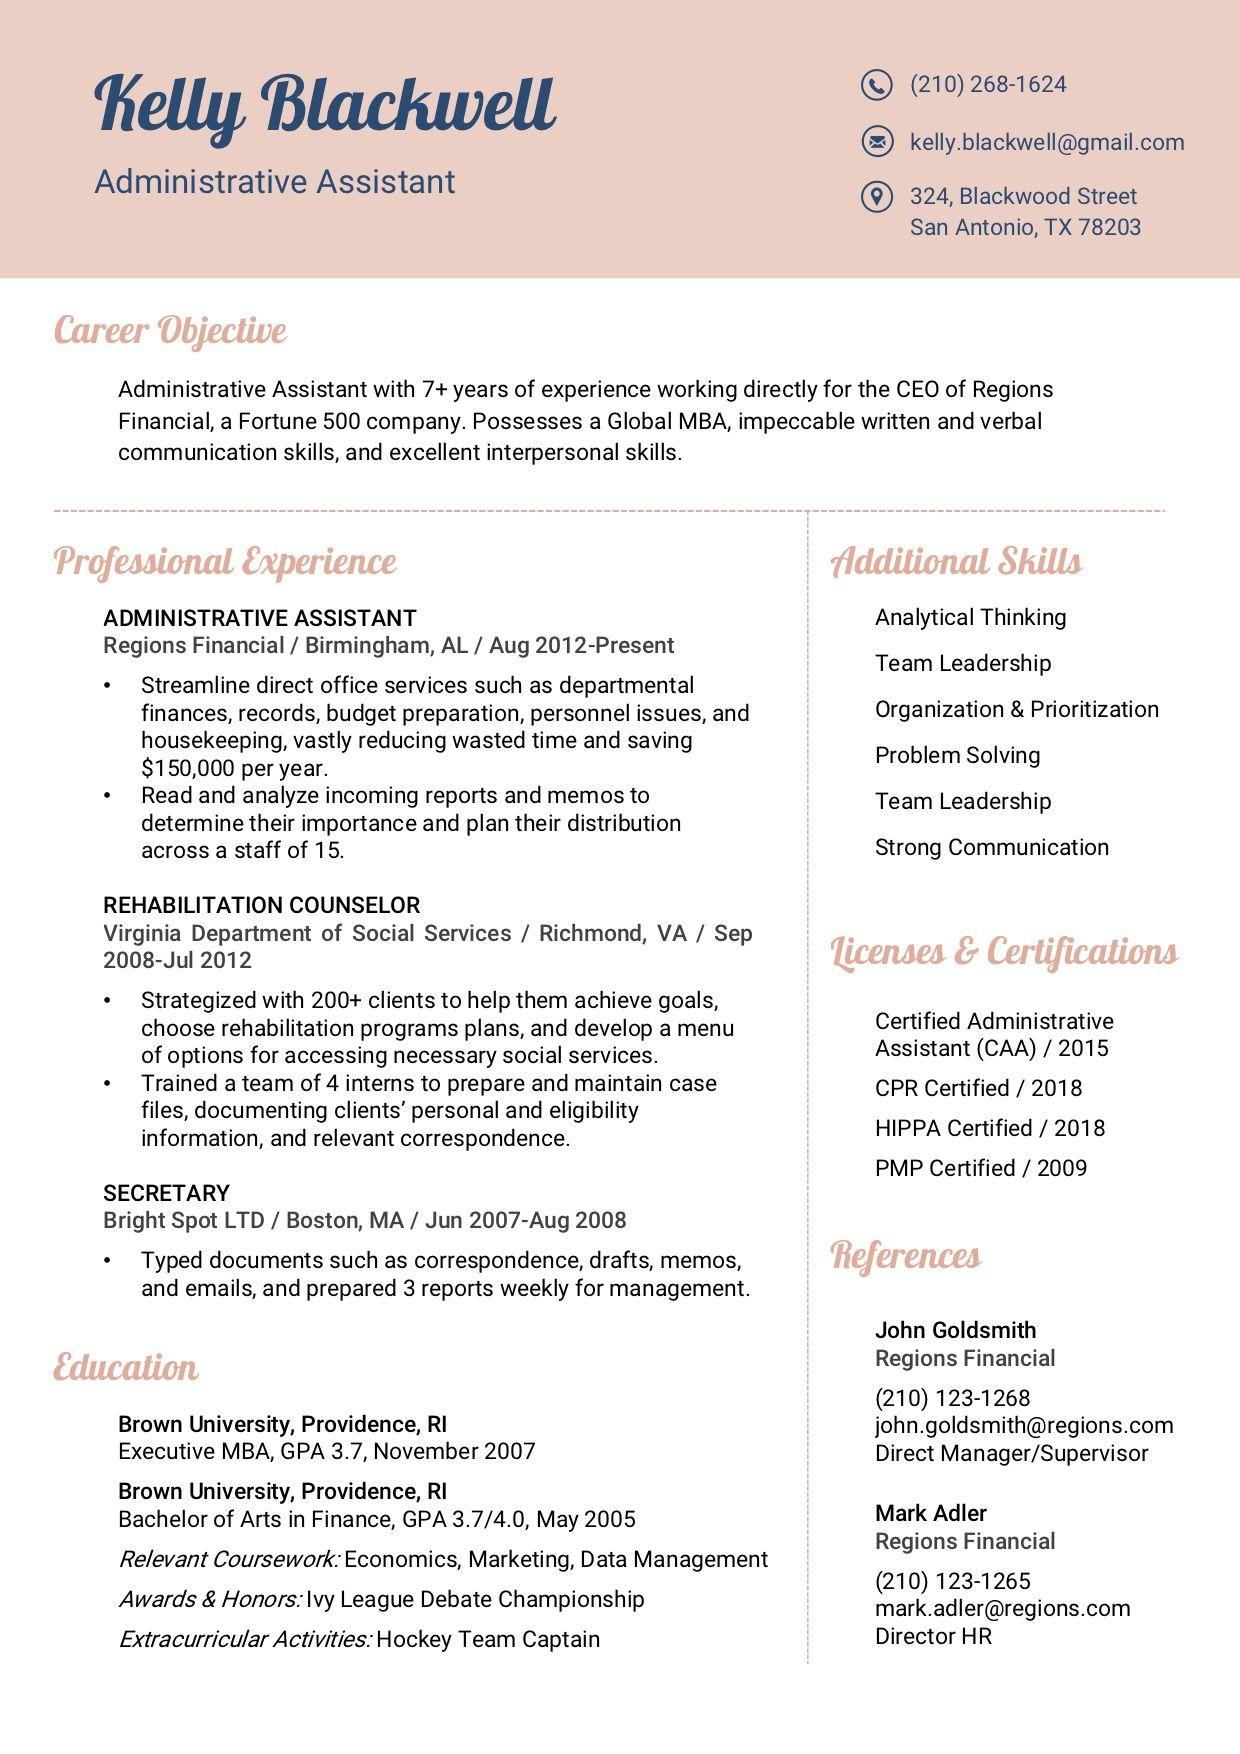 Resume template 8c rc verbal communication skills